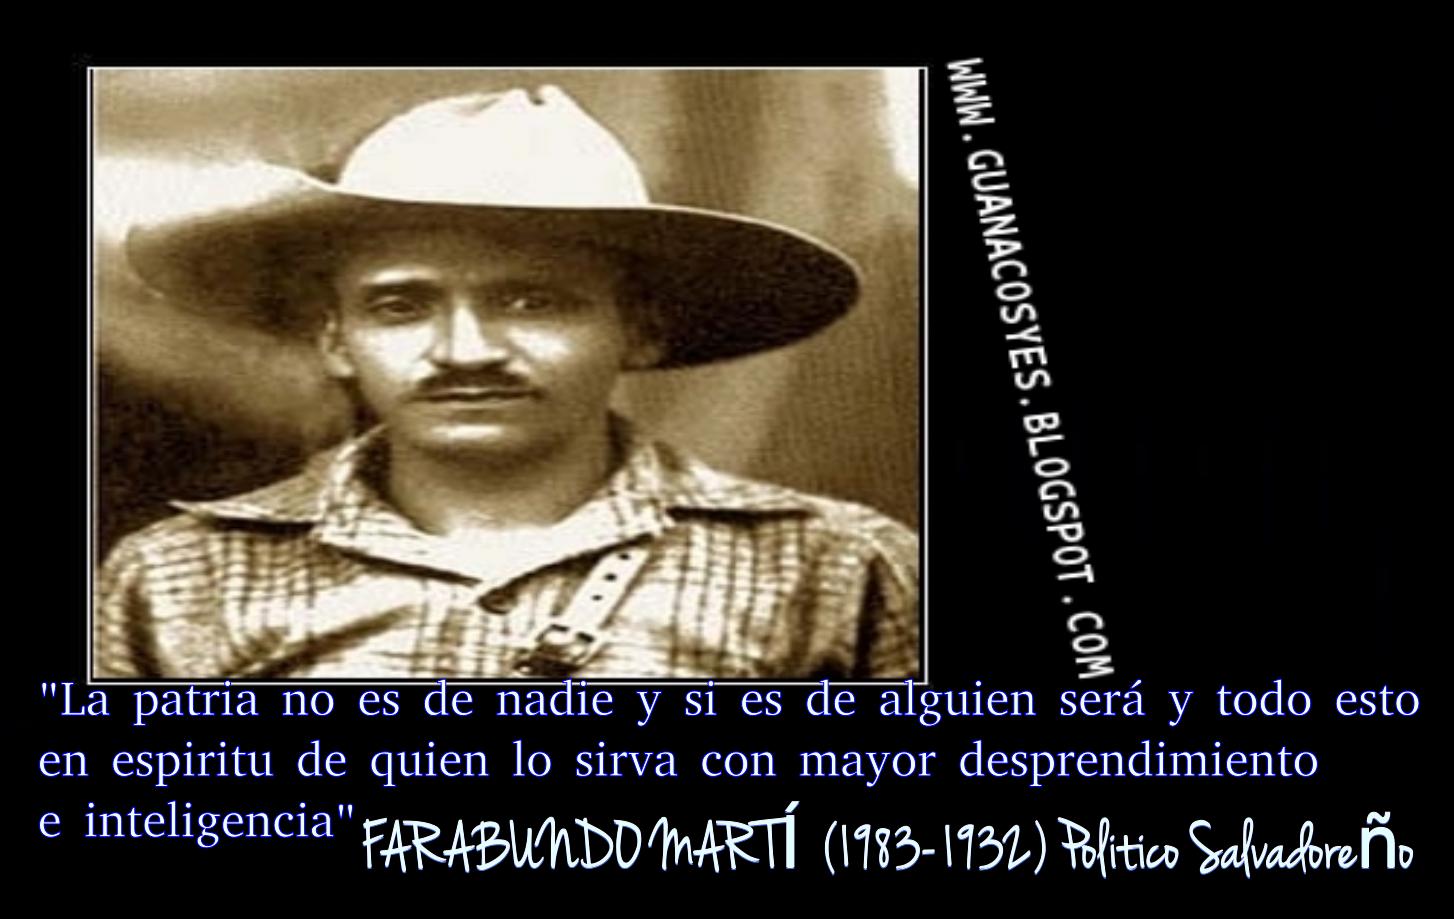 Cuscatlecos Yes Fraces Celebres De Farabundo Marti